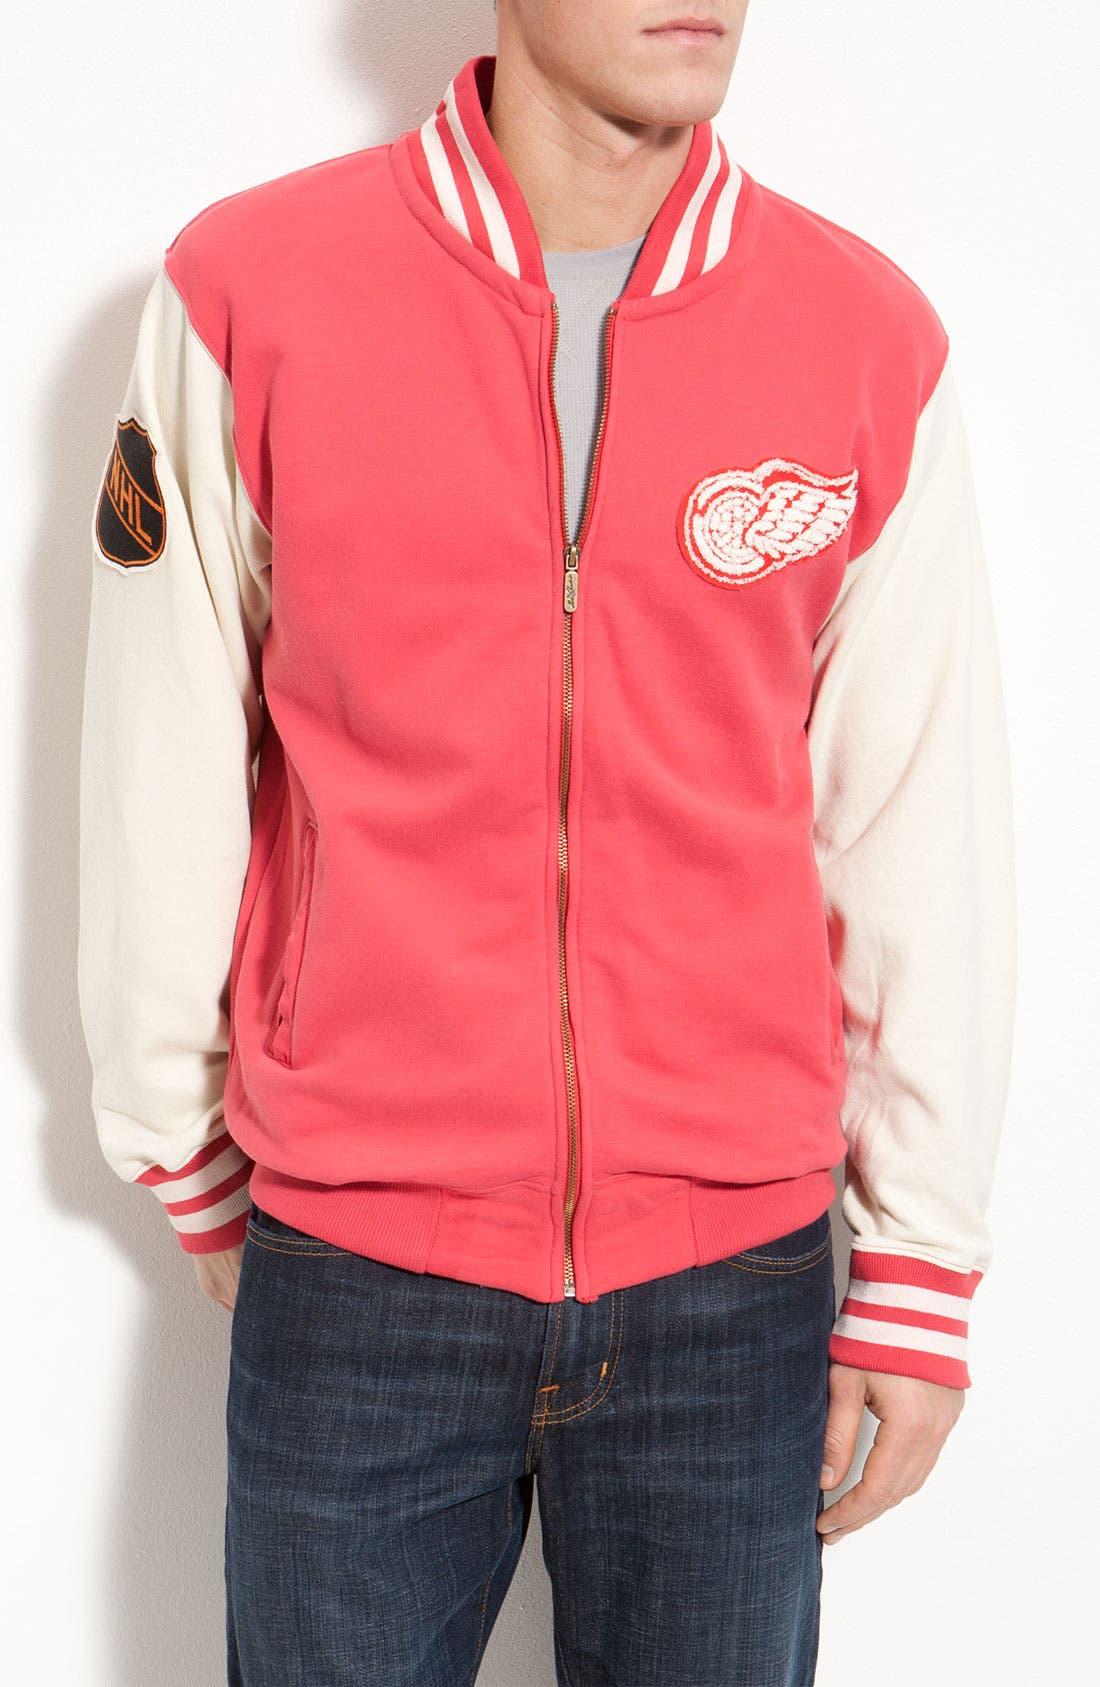 Main Image - Red Jacket 'Homeroom Red Wings' Jacket